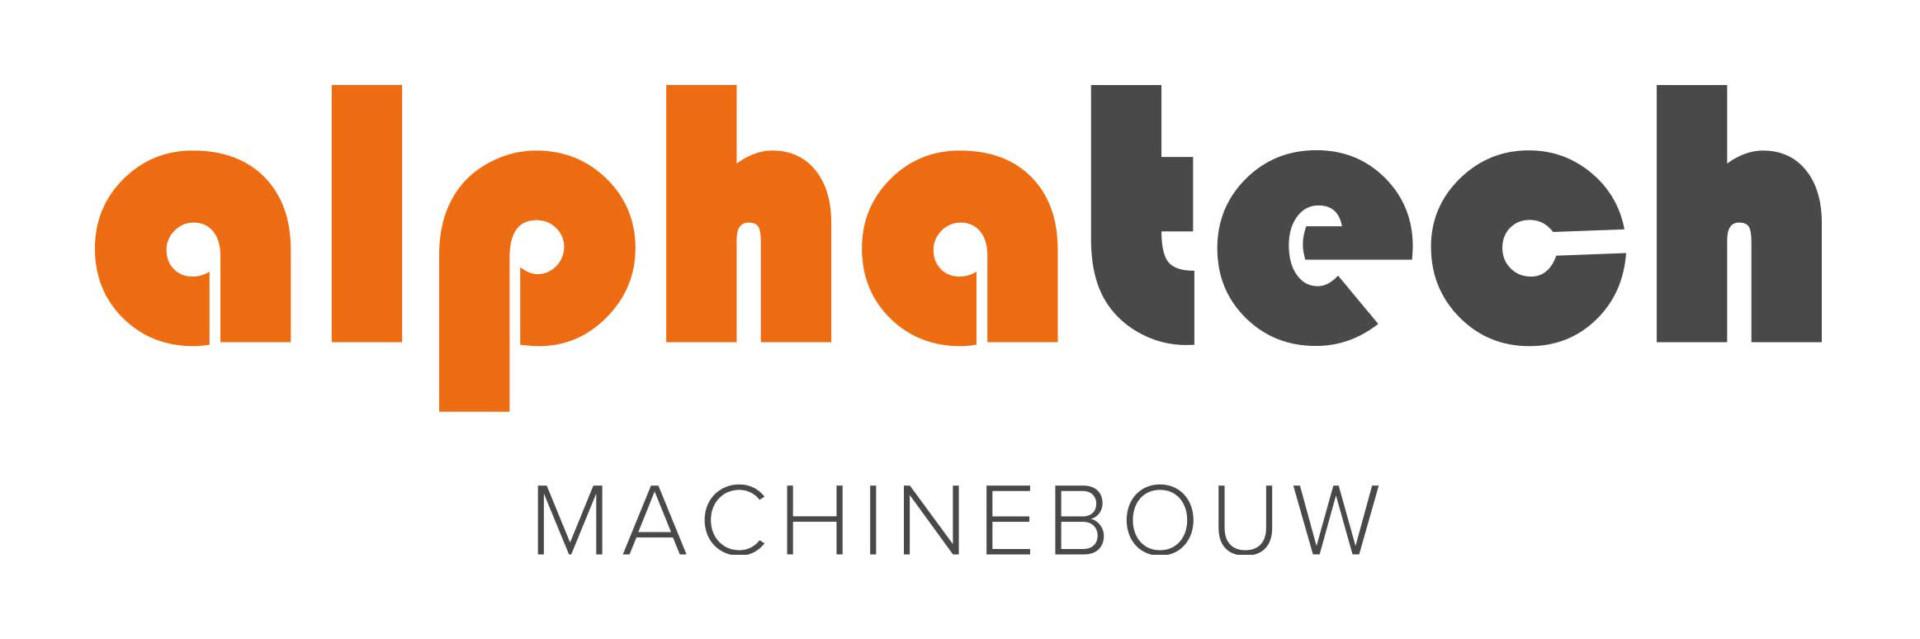 Alphatech Machinebouw